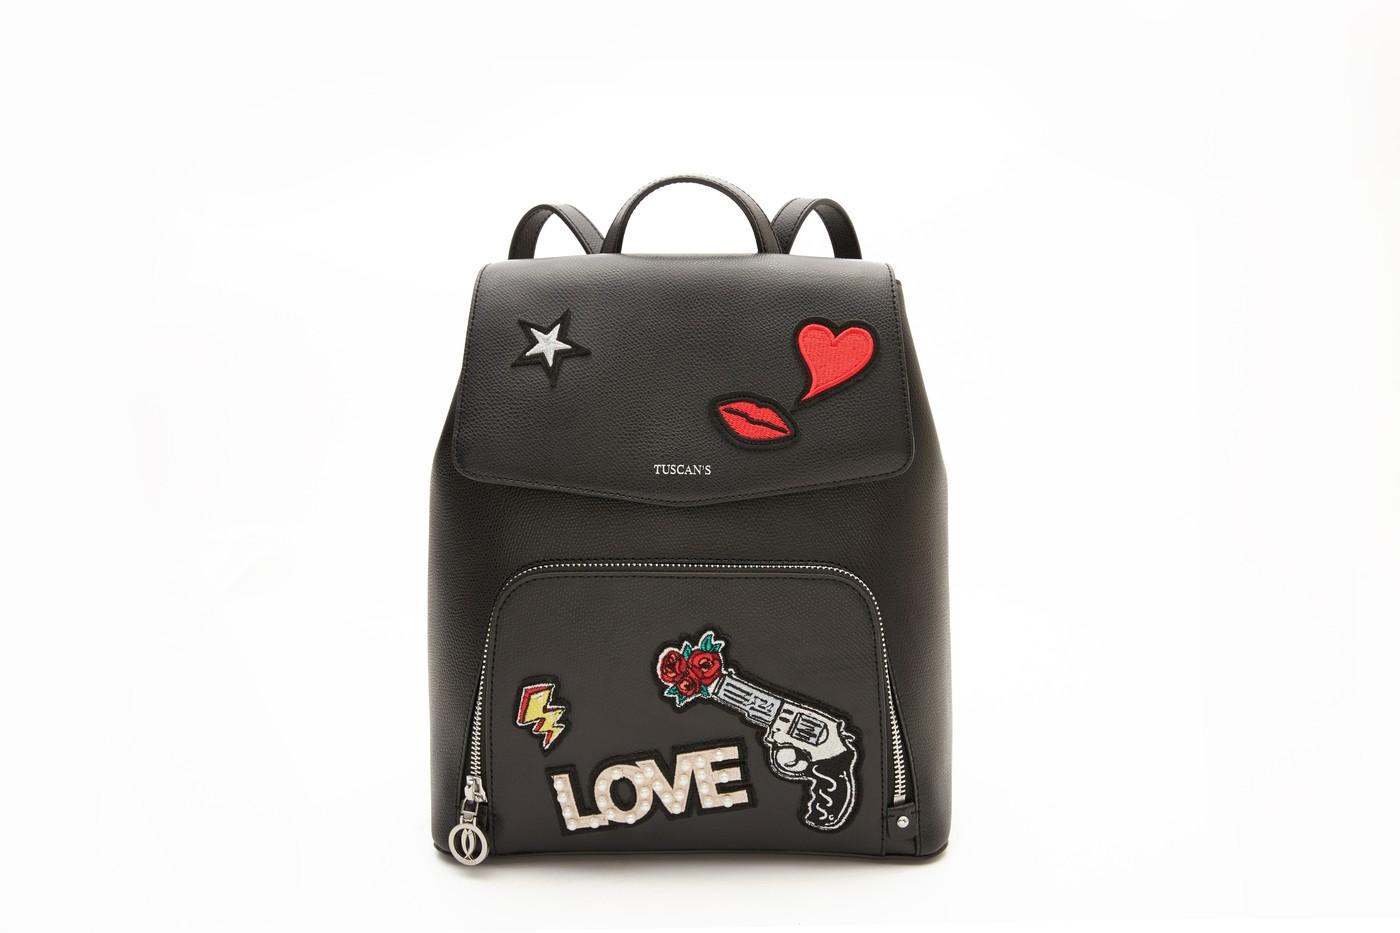 West Backpack - 背包